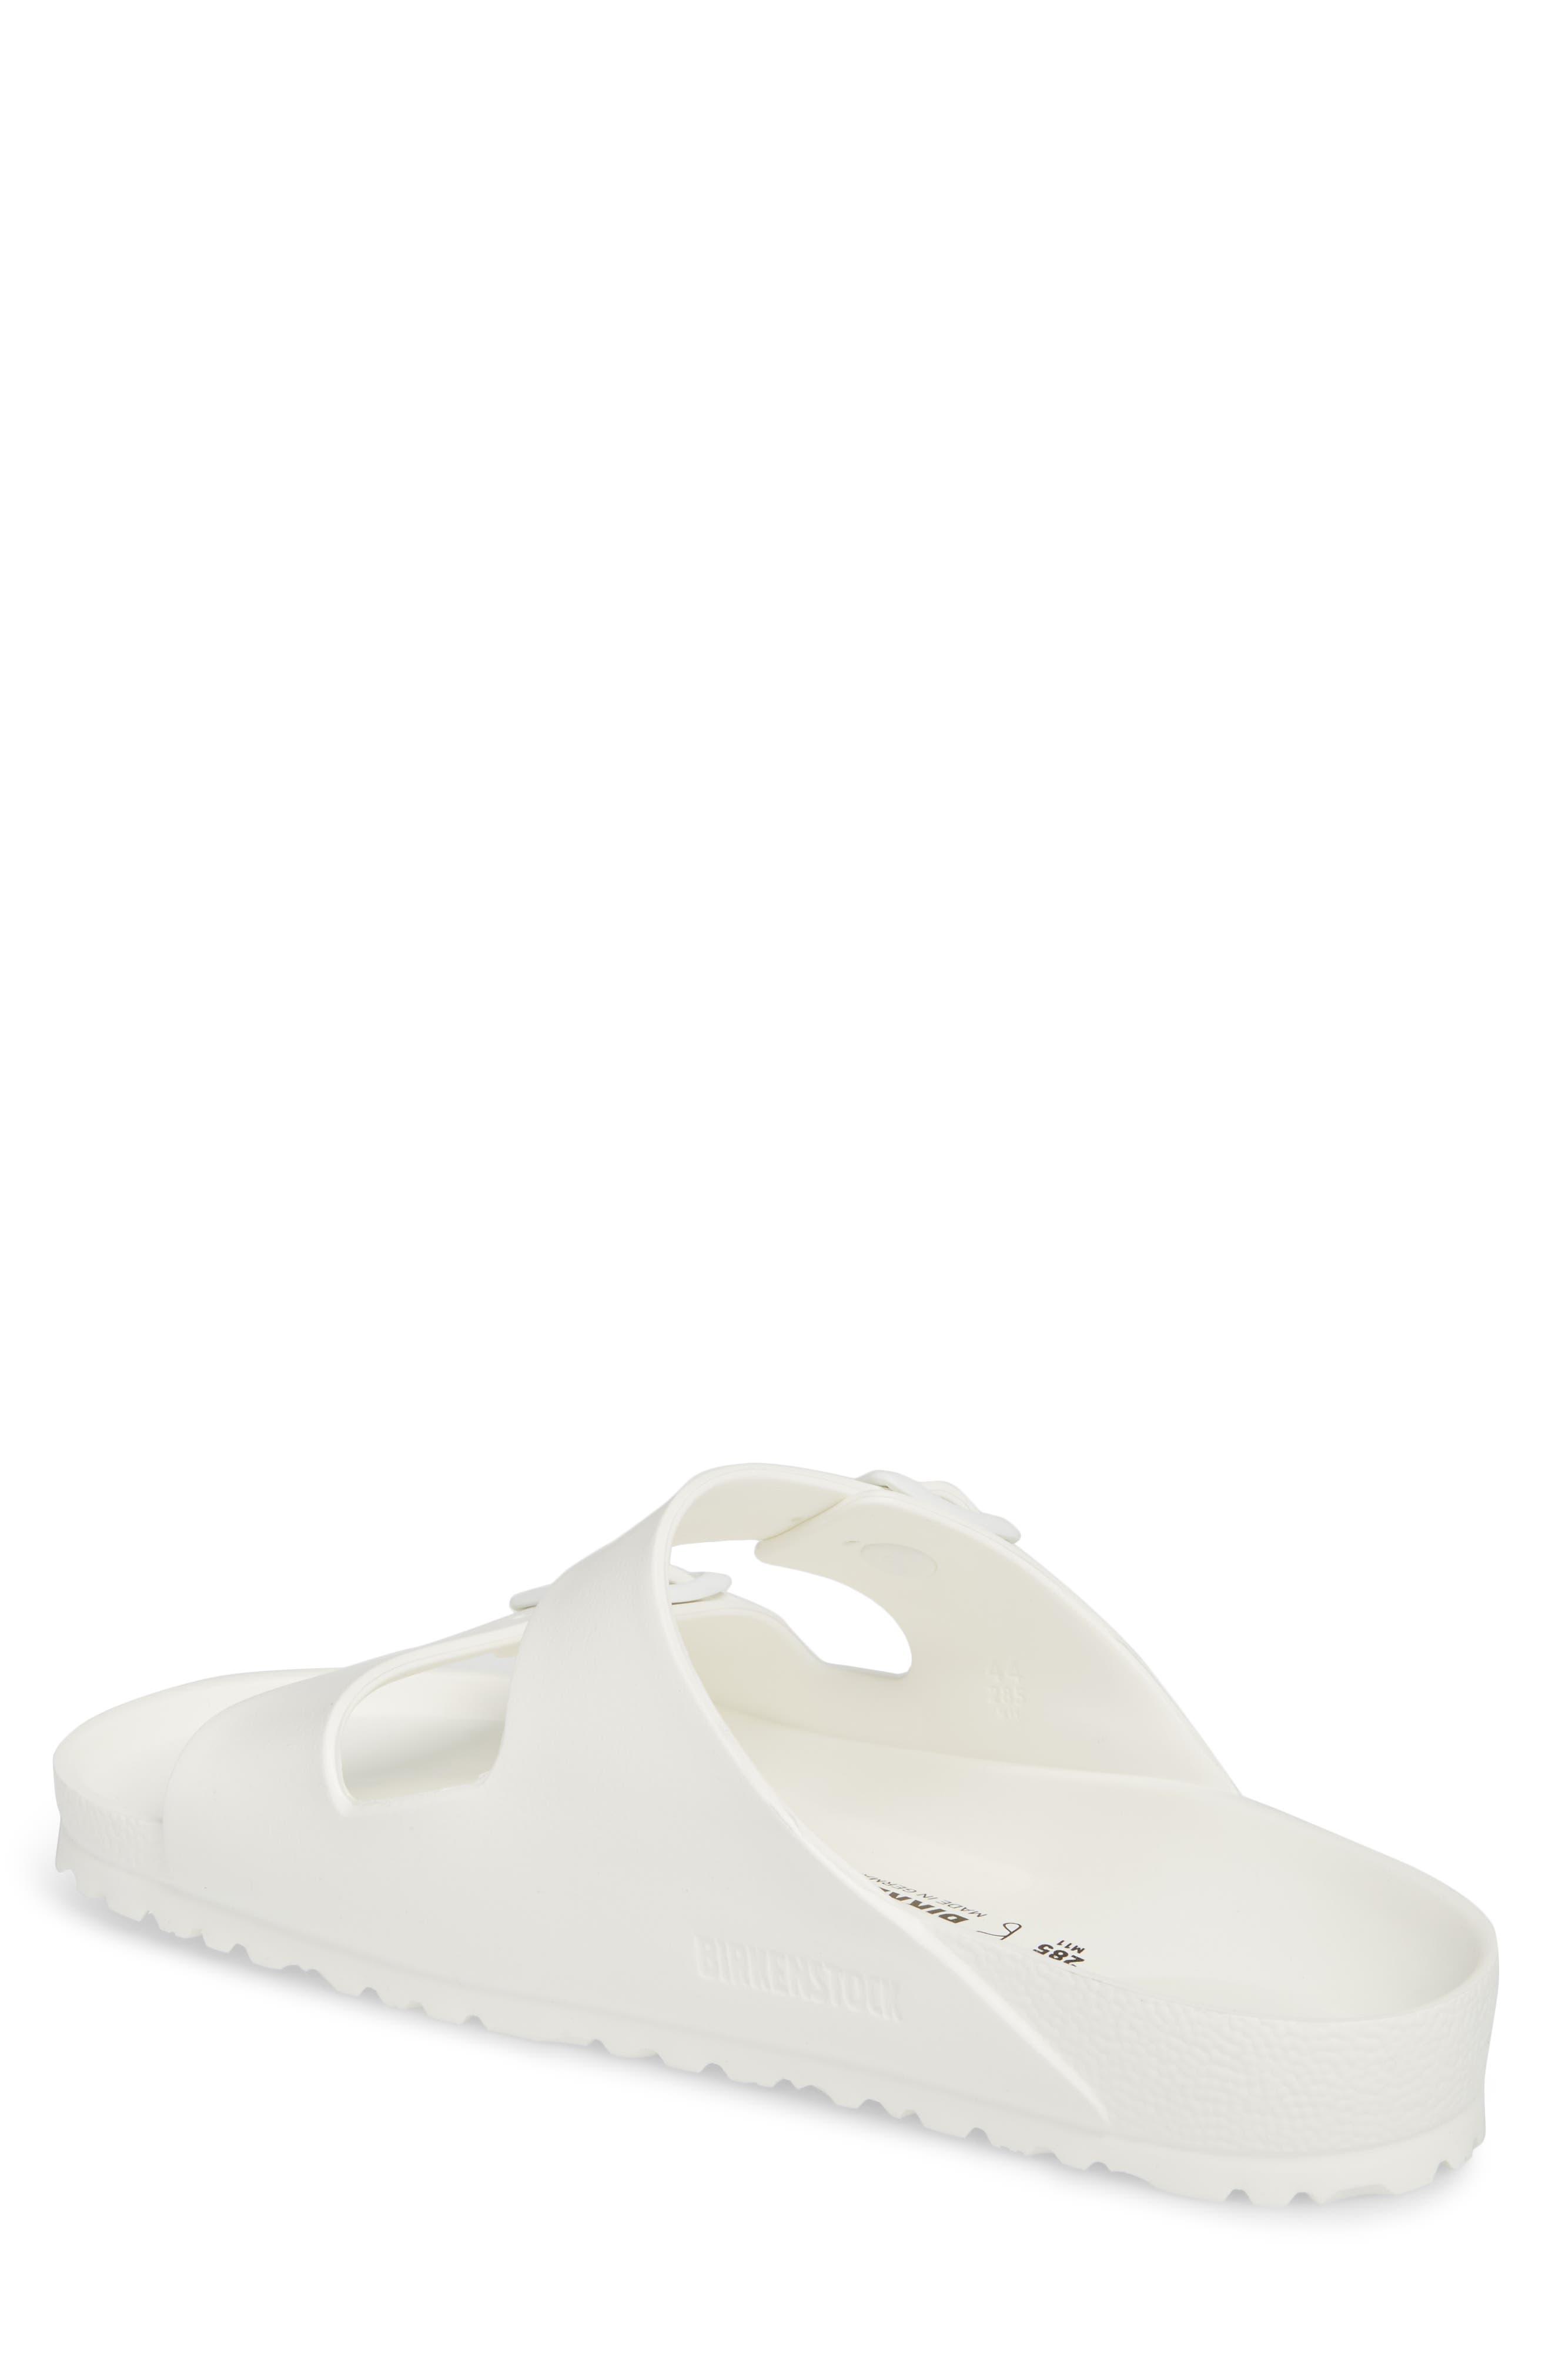 'Essentials - Arizona EVA' Waterproof Slide Sandal,                             Alternate thumbnail 2, color,                             WHITE